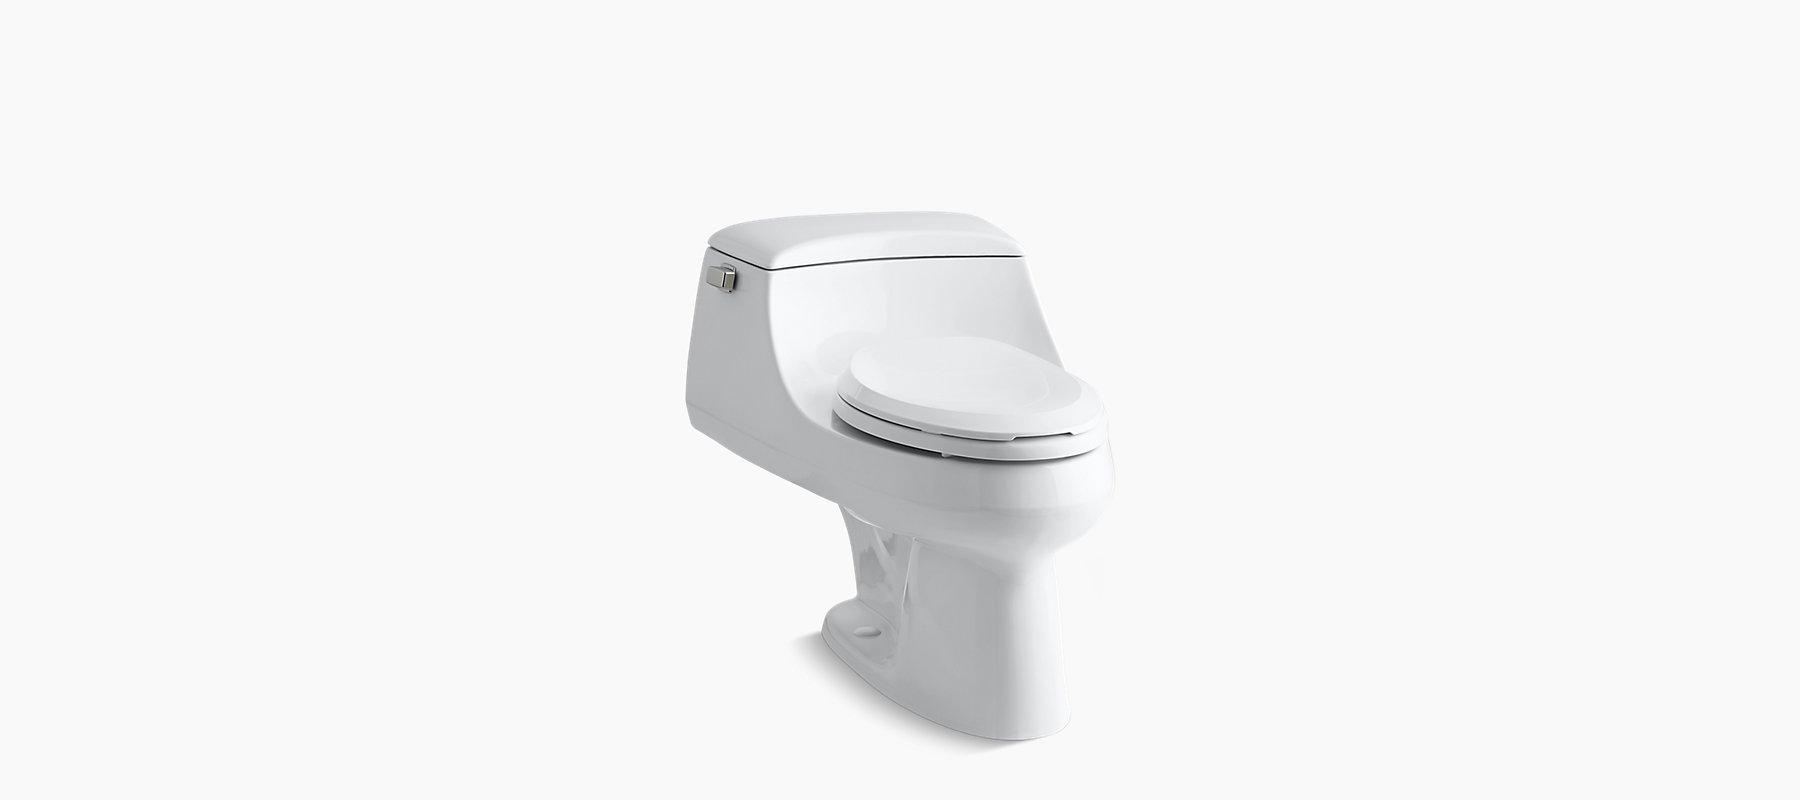 Home > Bathroom > Toilets